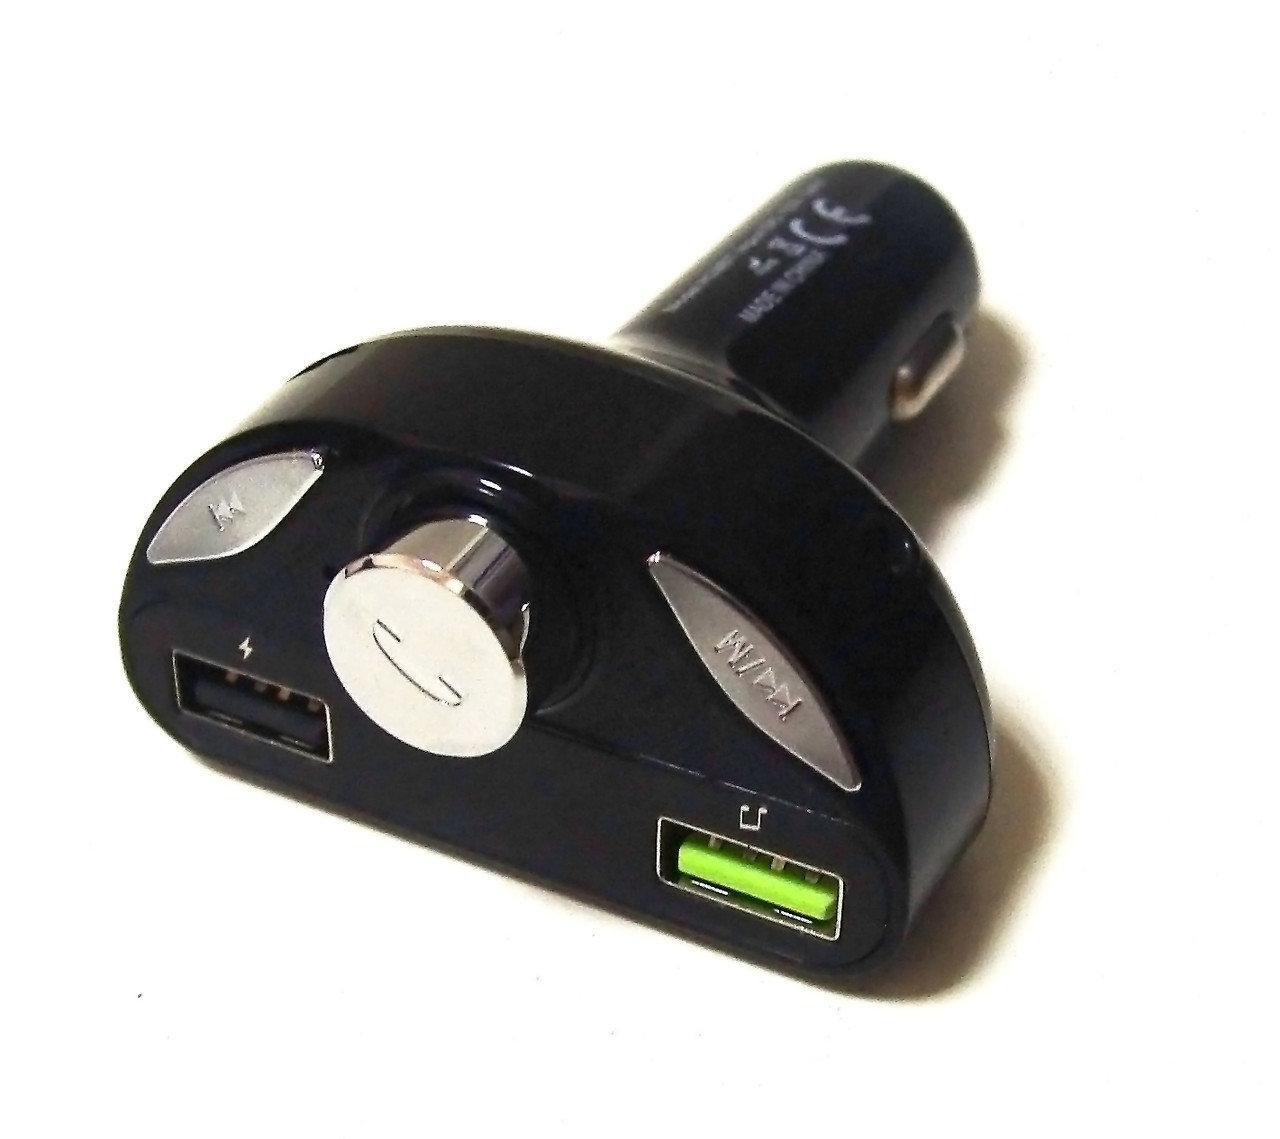 Трансмиттер / фм модулятор / Автомобильный трансмиттер H28BT Блютуз, 2 usb